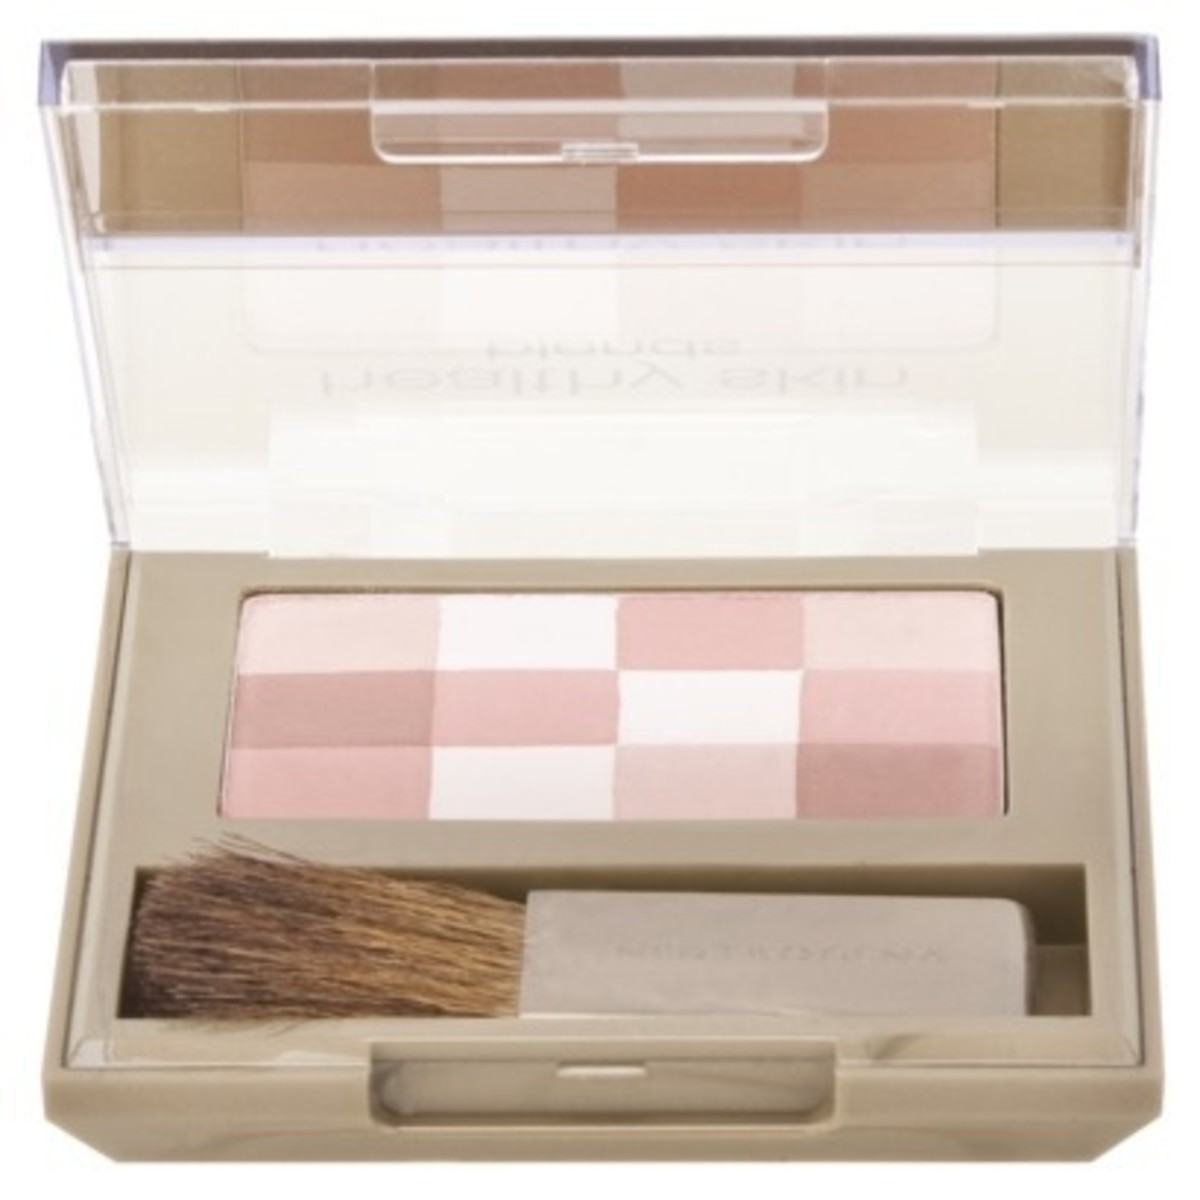 Neutrogena Healthy Skin Blends Natural Radiance Bronzer in Pure